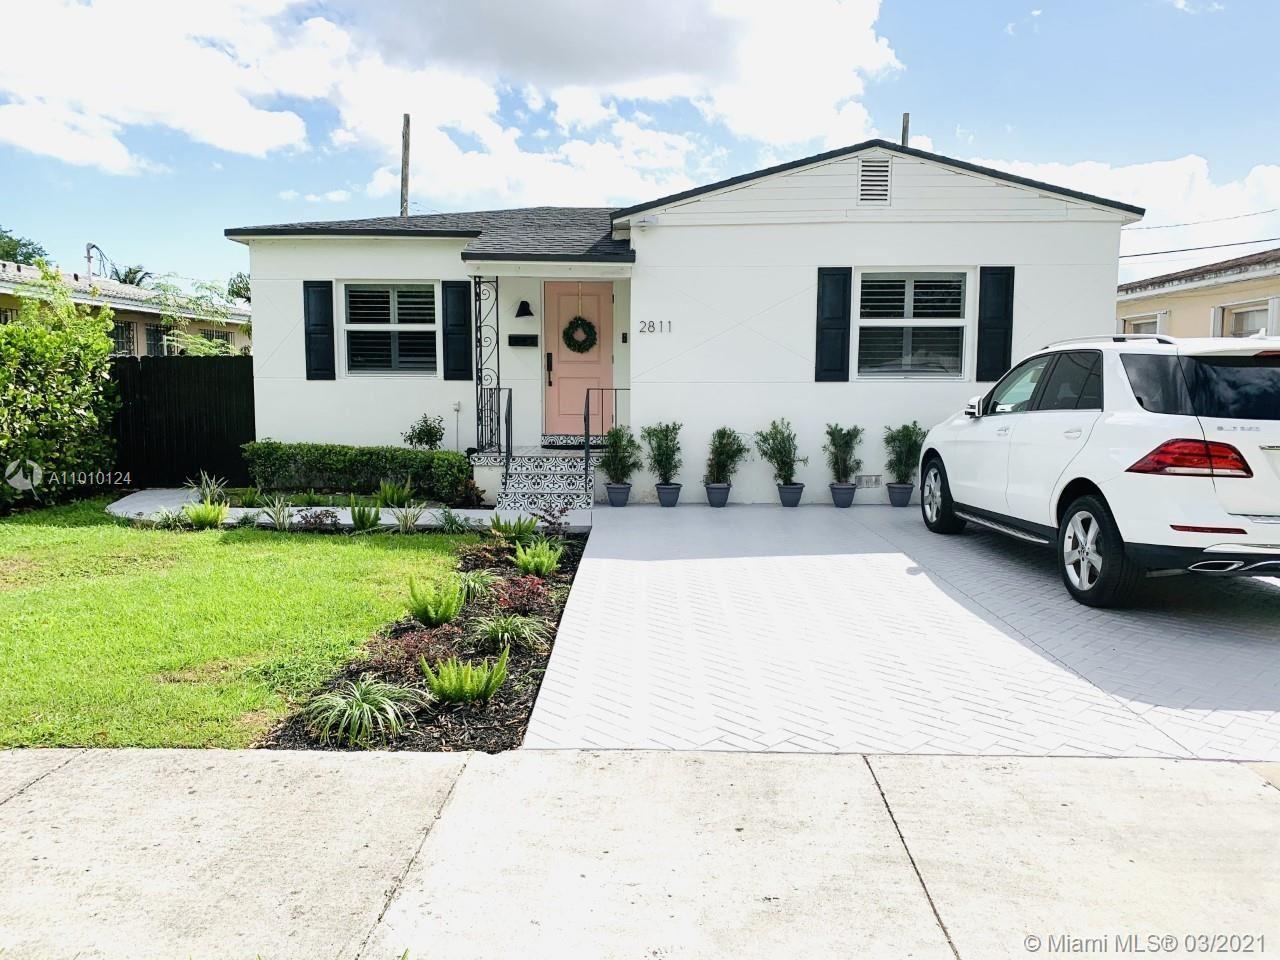 Photo of 2811 SW 68th Ave, Miami, FL 33155 (MLS # A11010124)